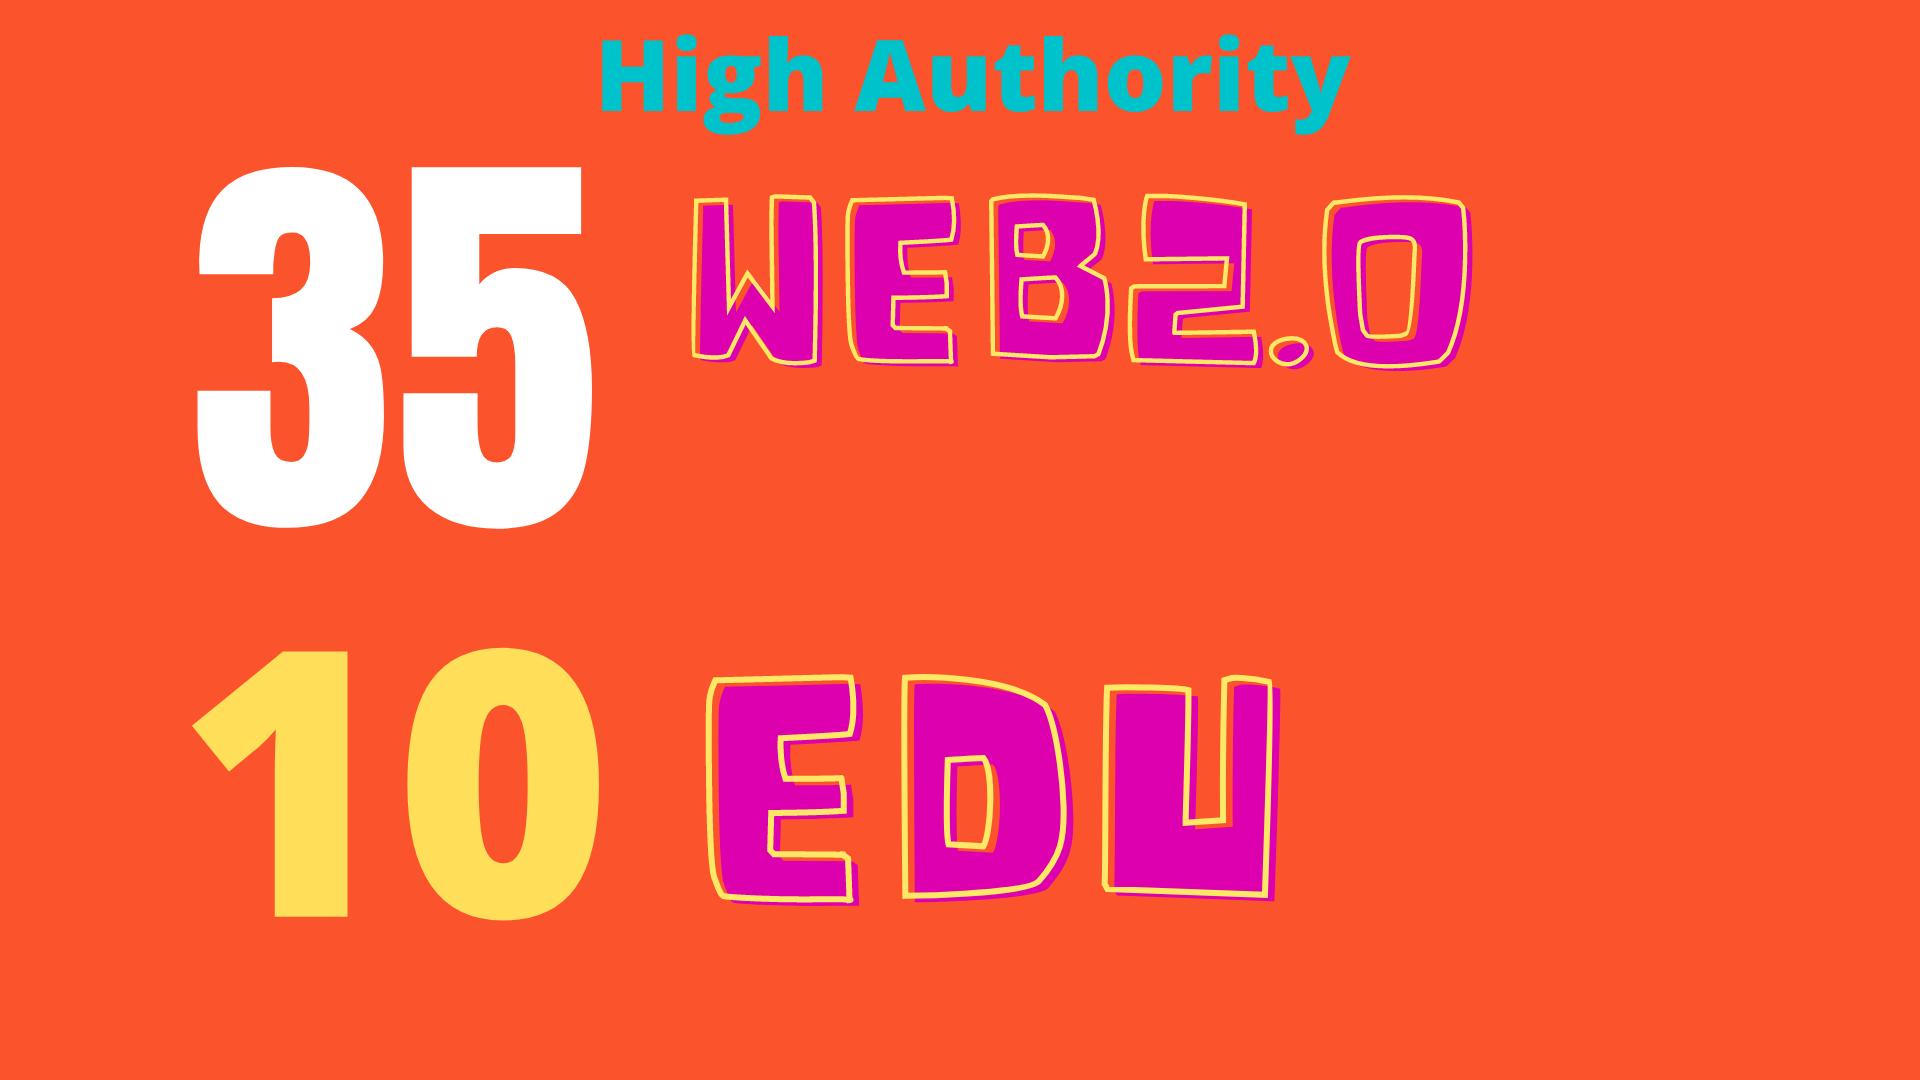 verified High Authority DA90-80+ Backlinks 35 web2.0 and 10 EDU/GOV TOP RANKING SEO